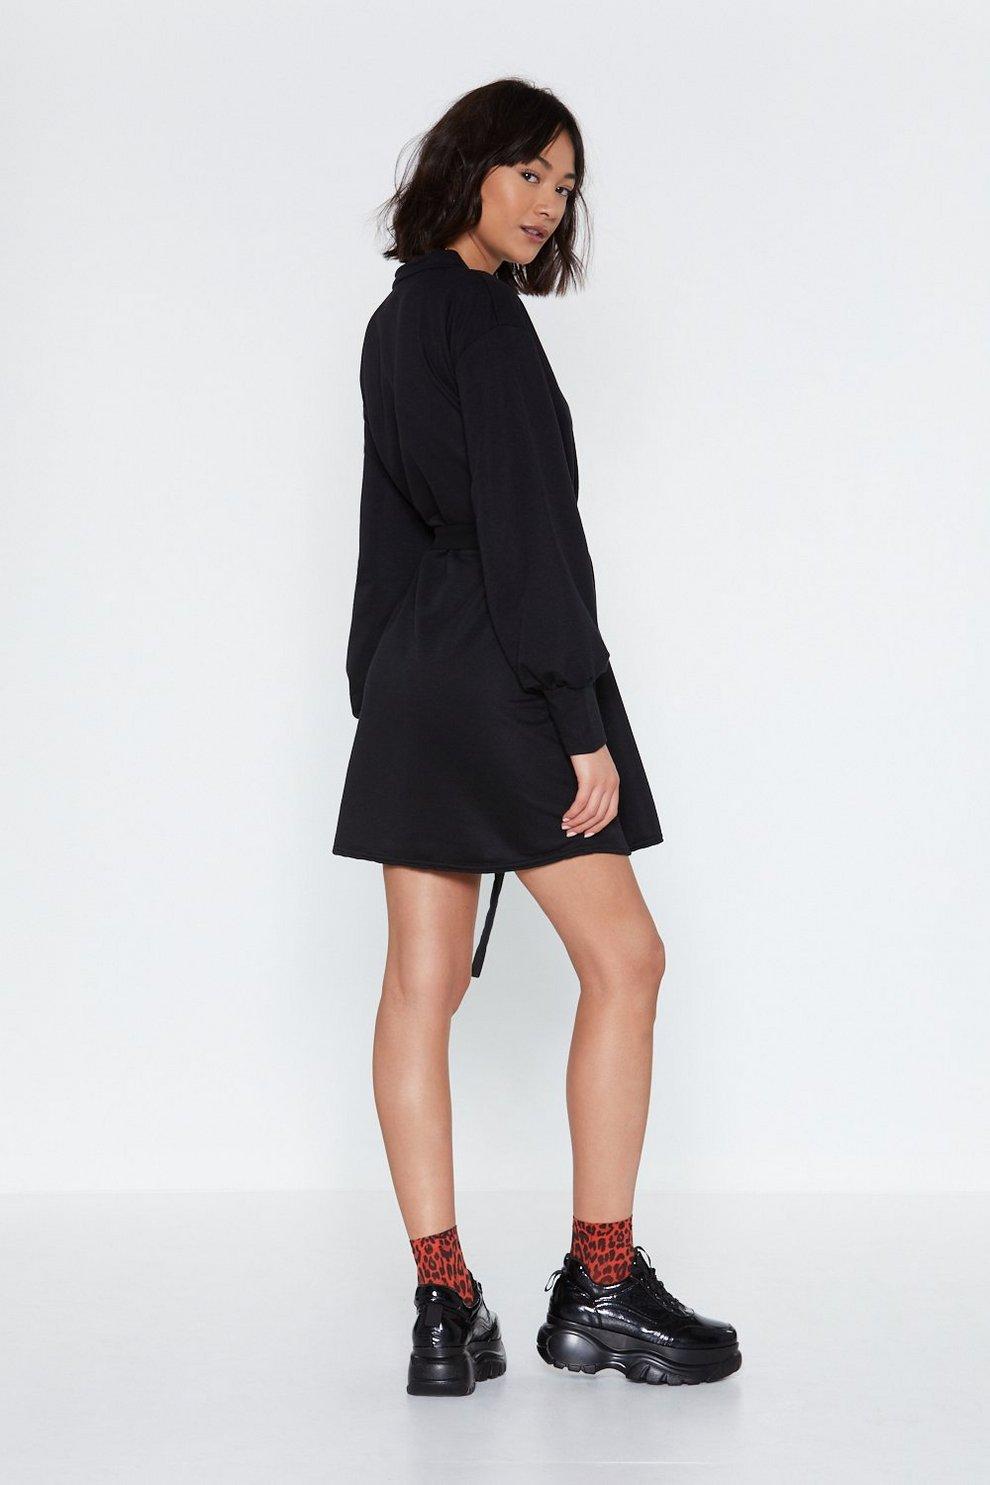 314a6c73d40 Fasten Your Seat-Belts Sweater Dress